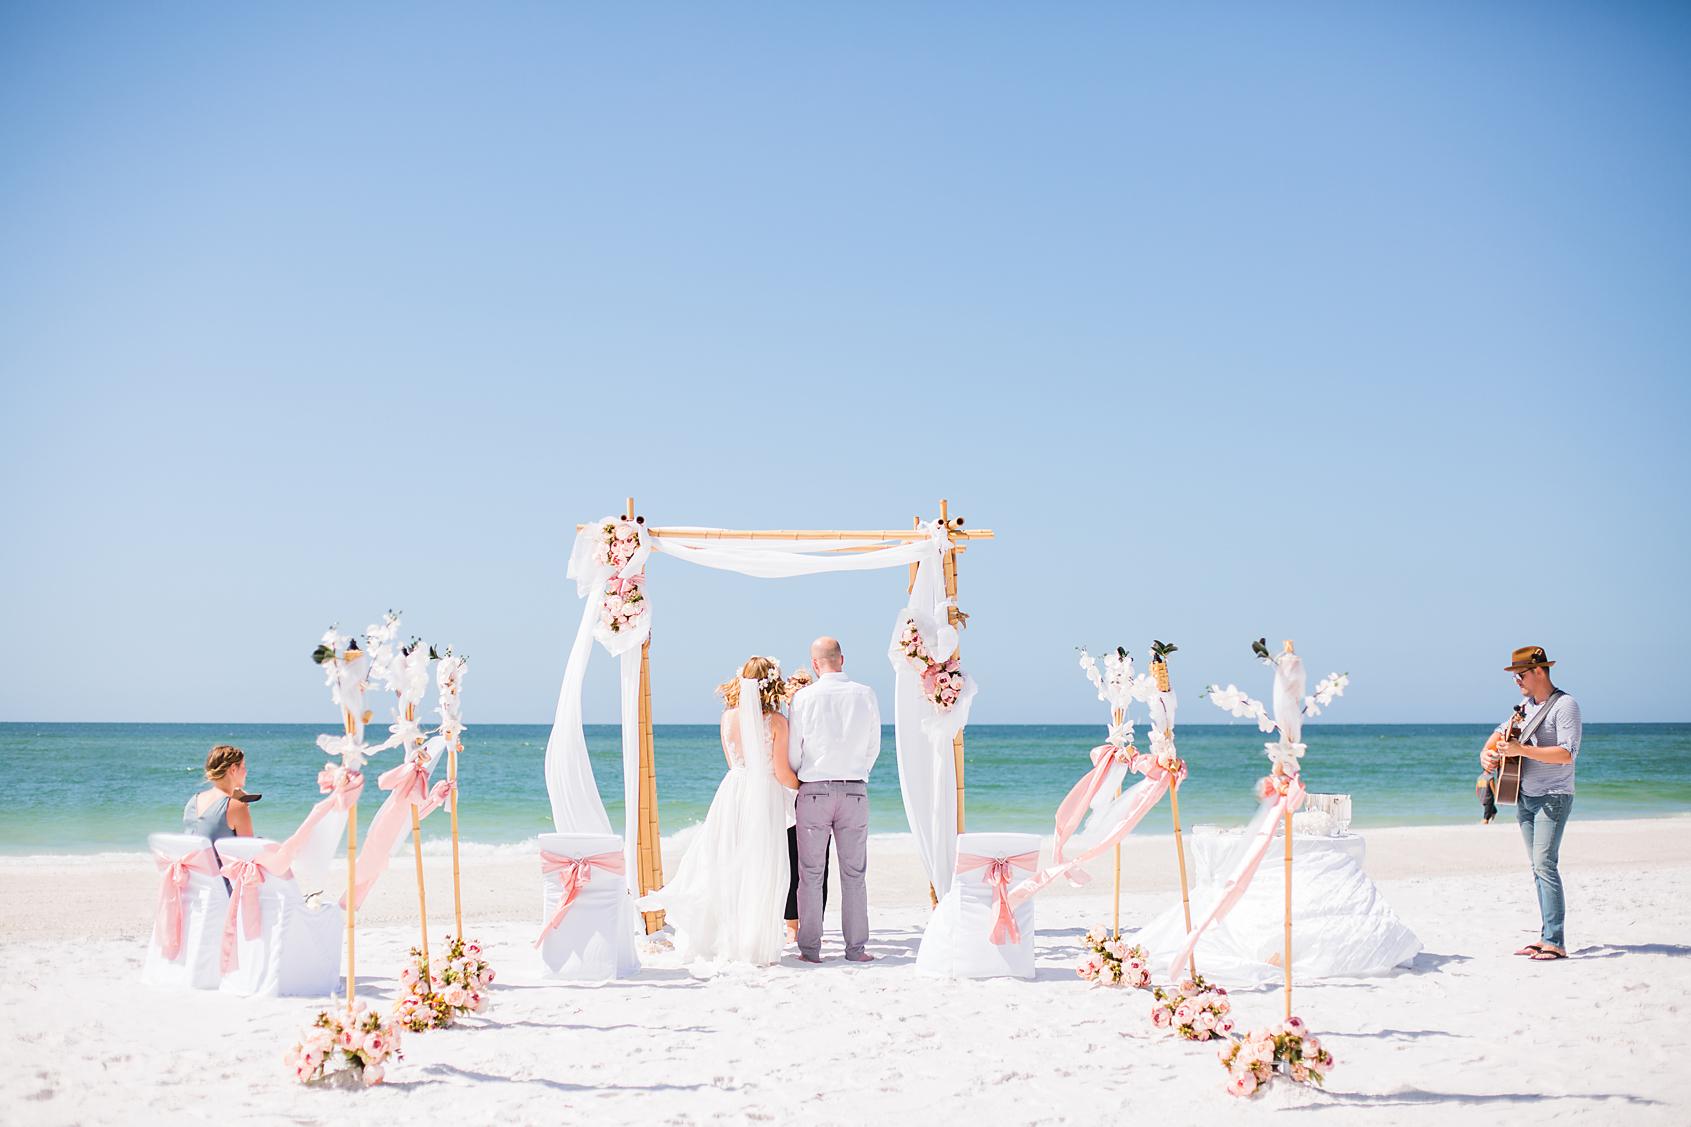 Luise + Daniel - Anna Maria Island Wedding Photography - Emily & Co 3.jpg